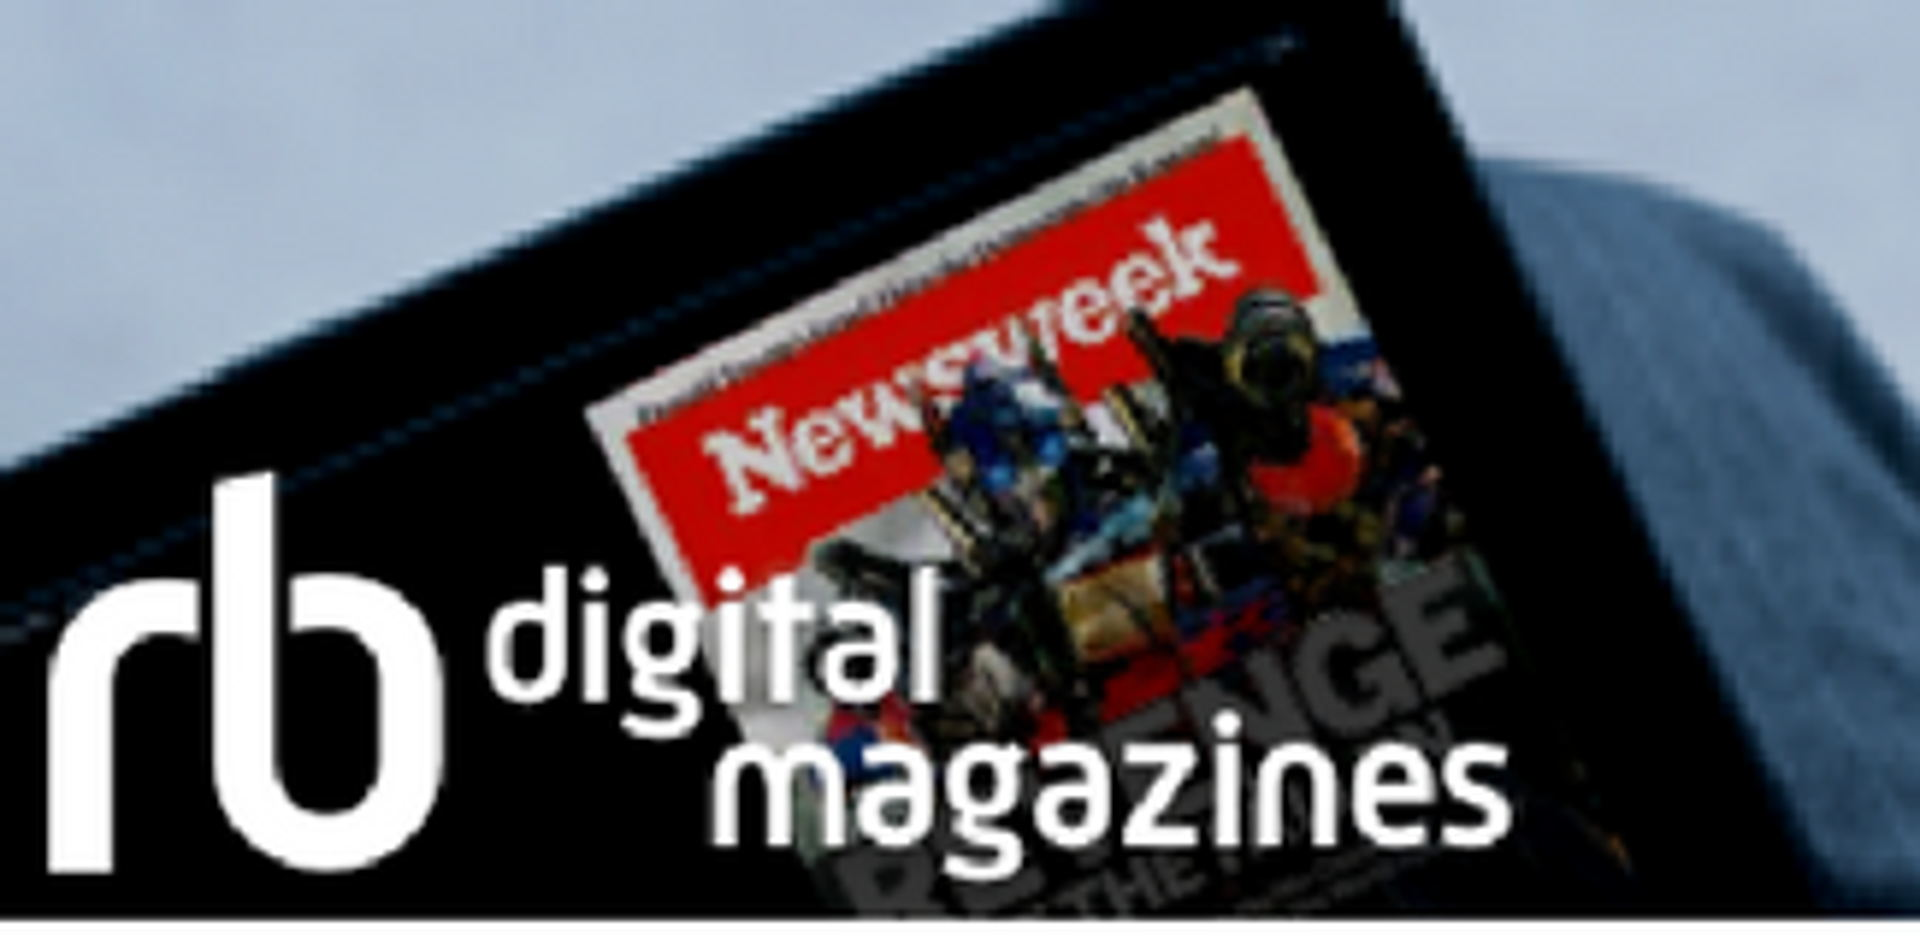 RB Digital Magazines